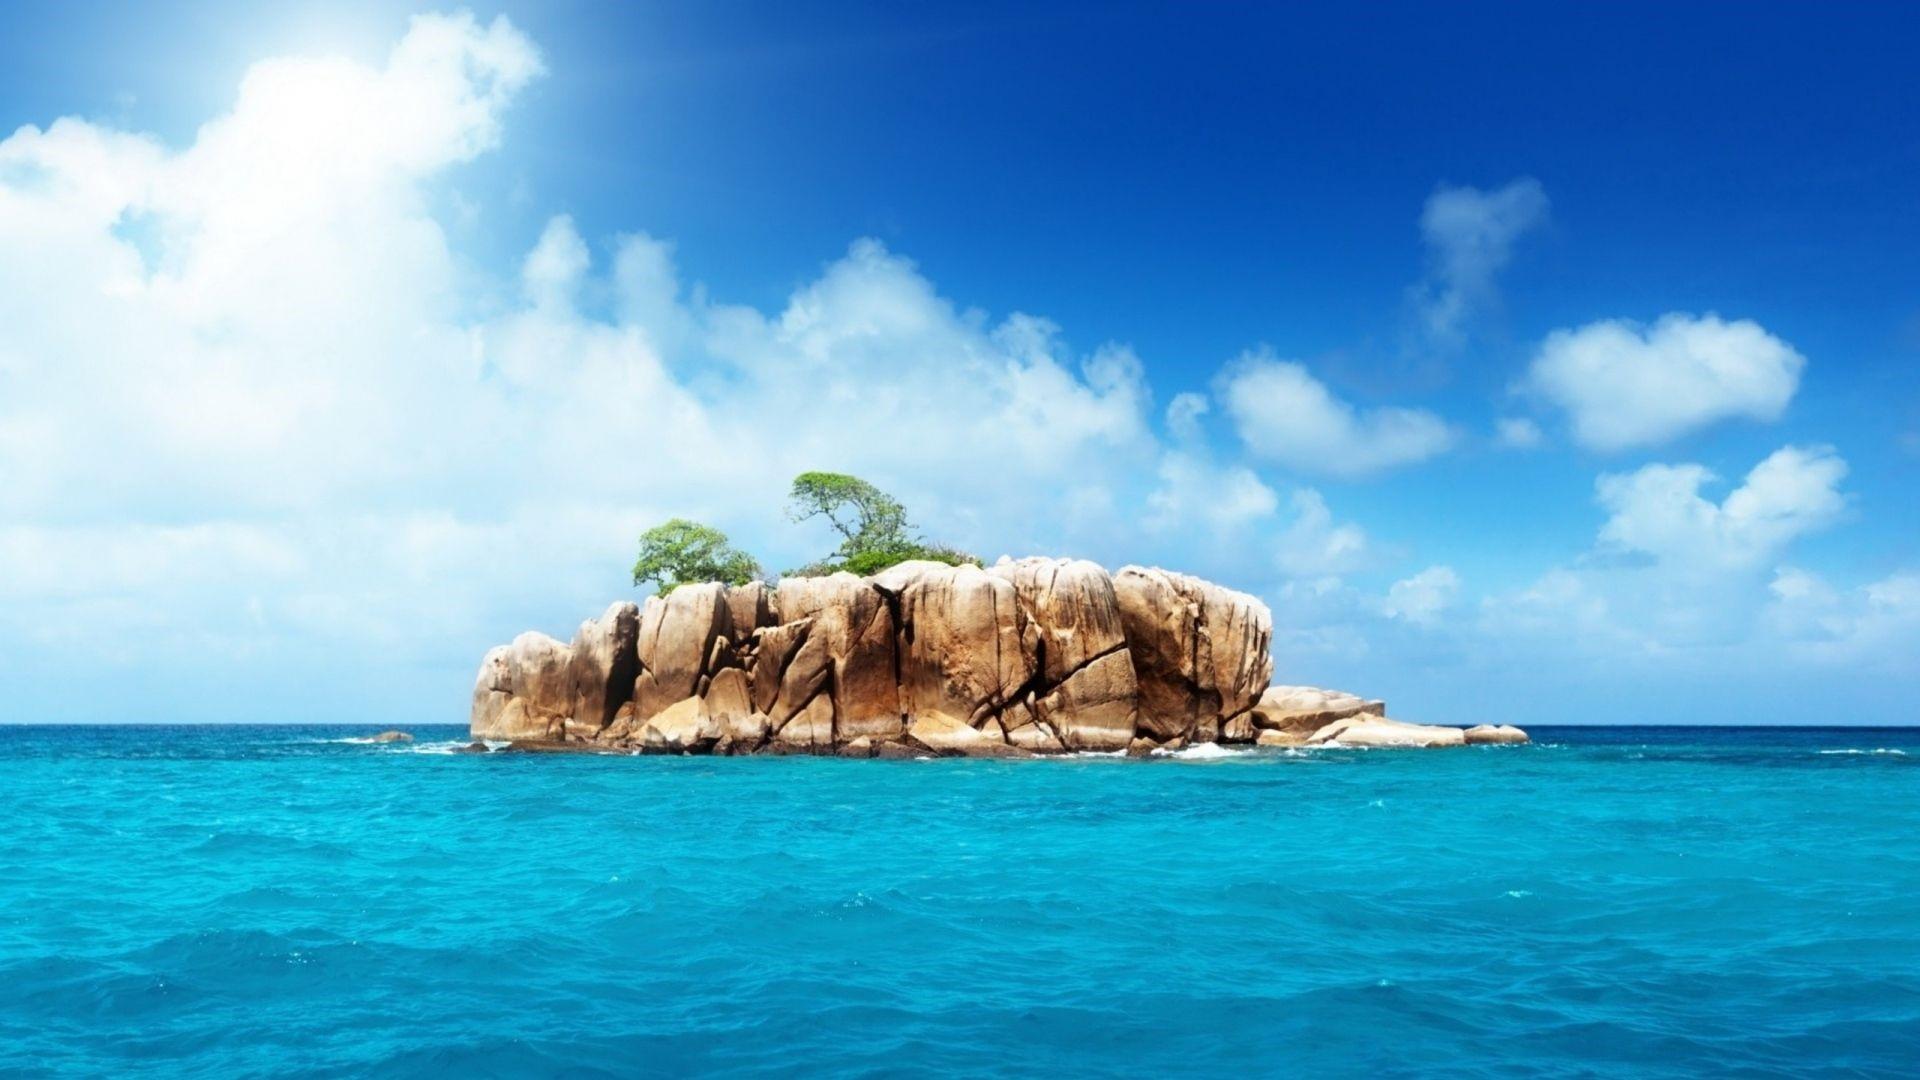 Island Mobile HD Wallpaper